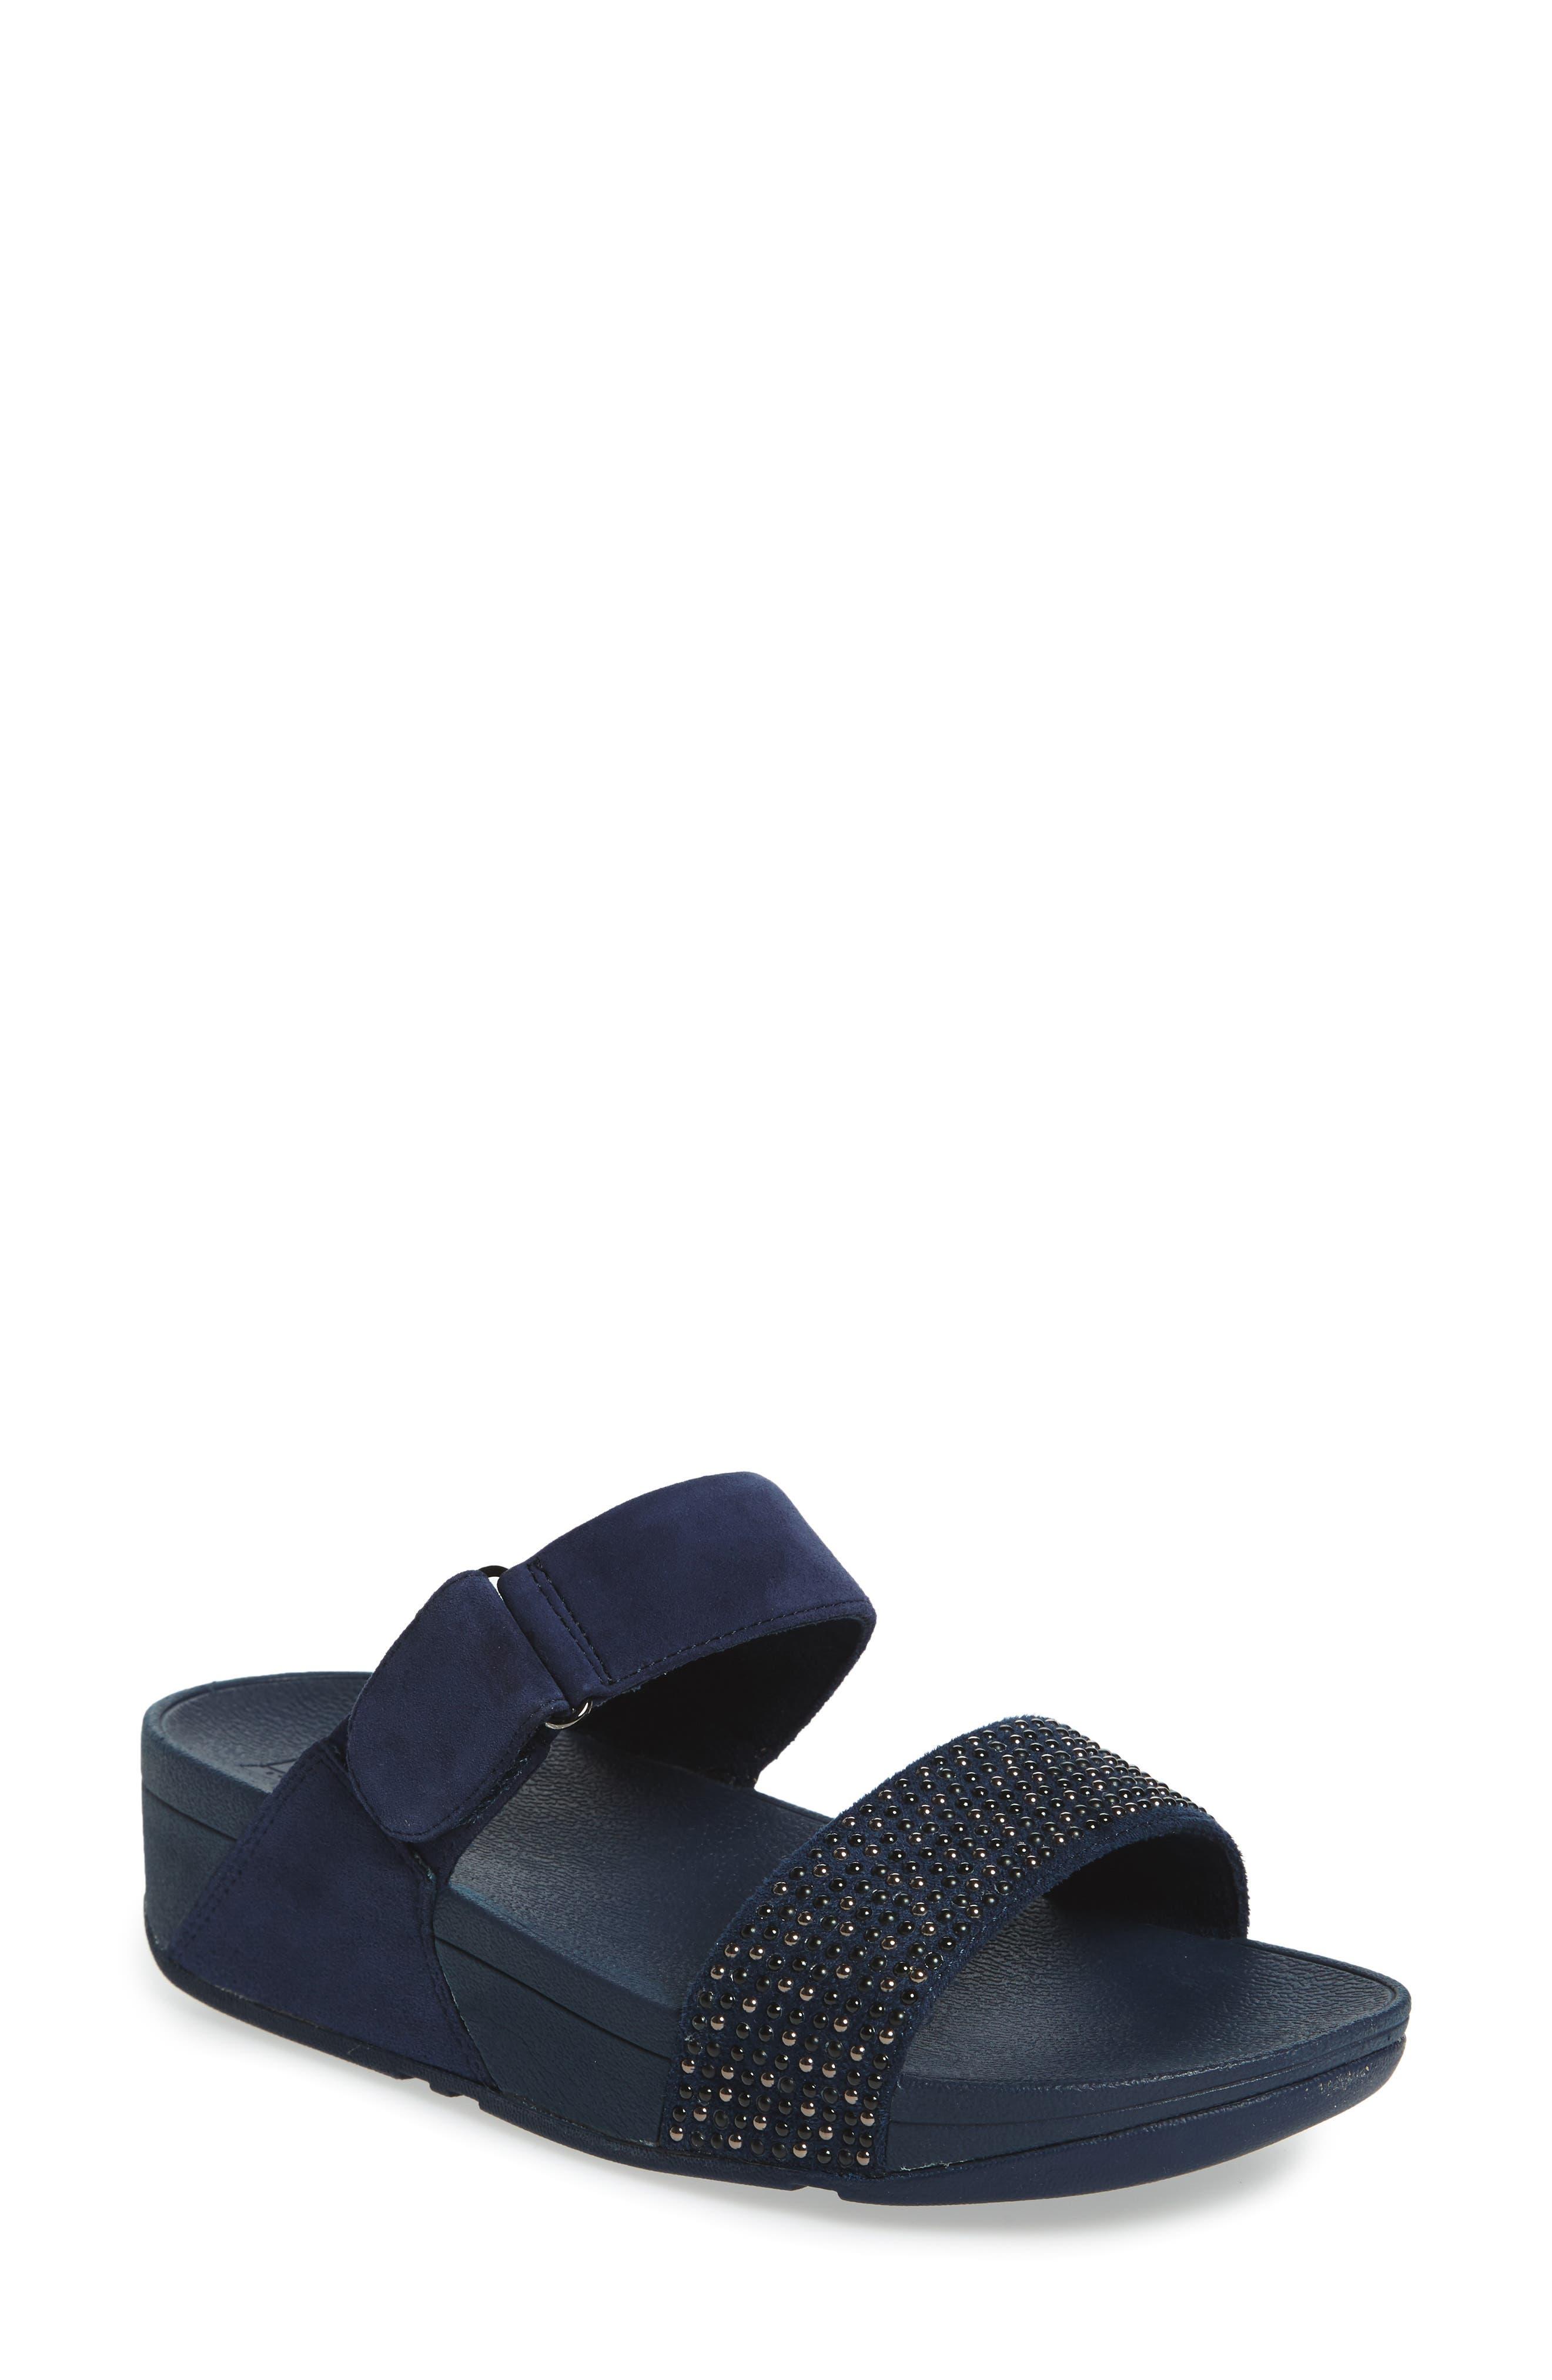 Main Image - FitFlop Lulu Popstud Wedge Slide Sandal (Women)